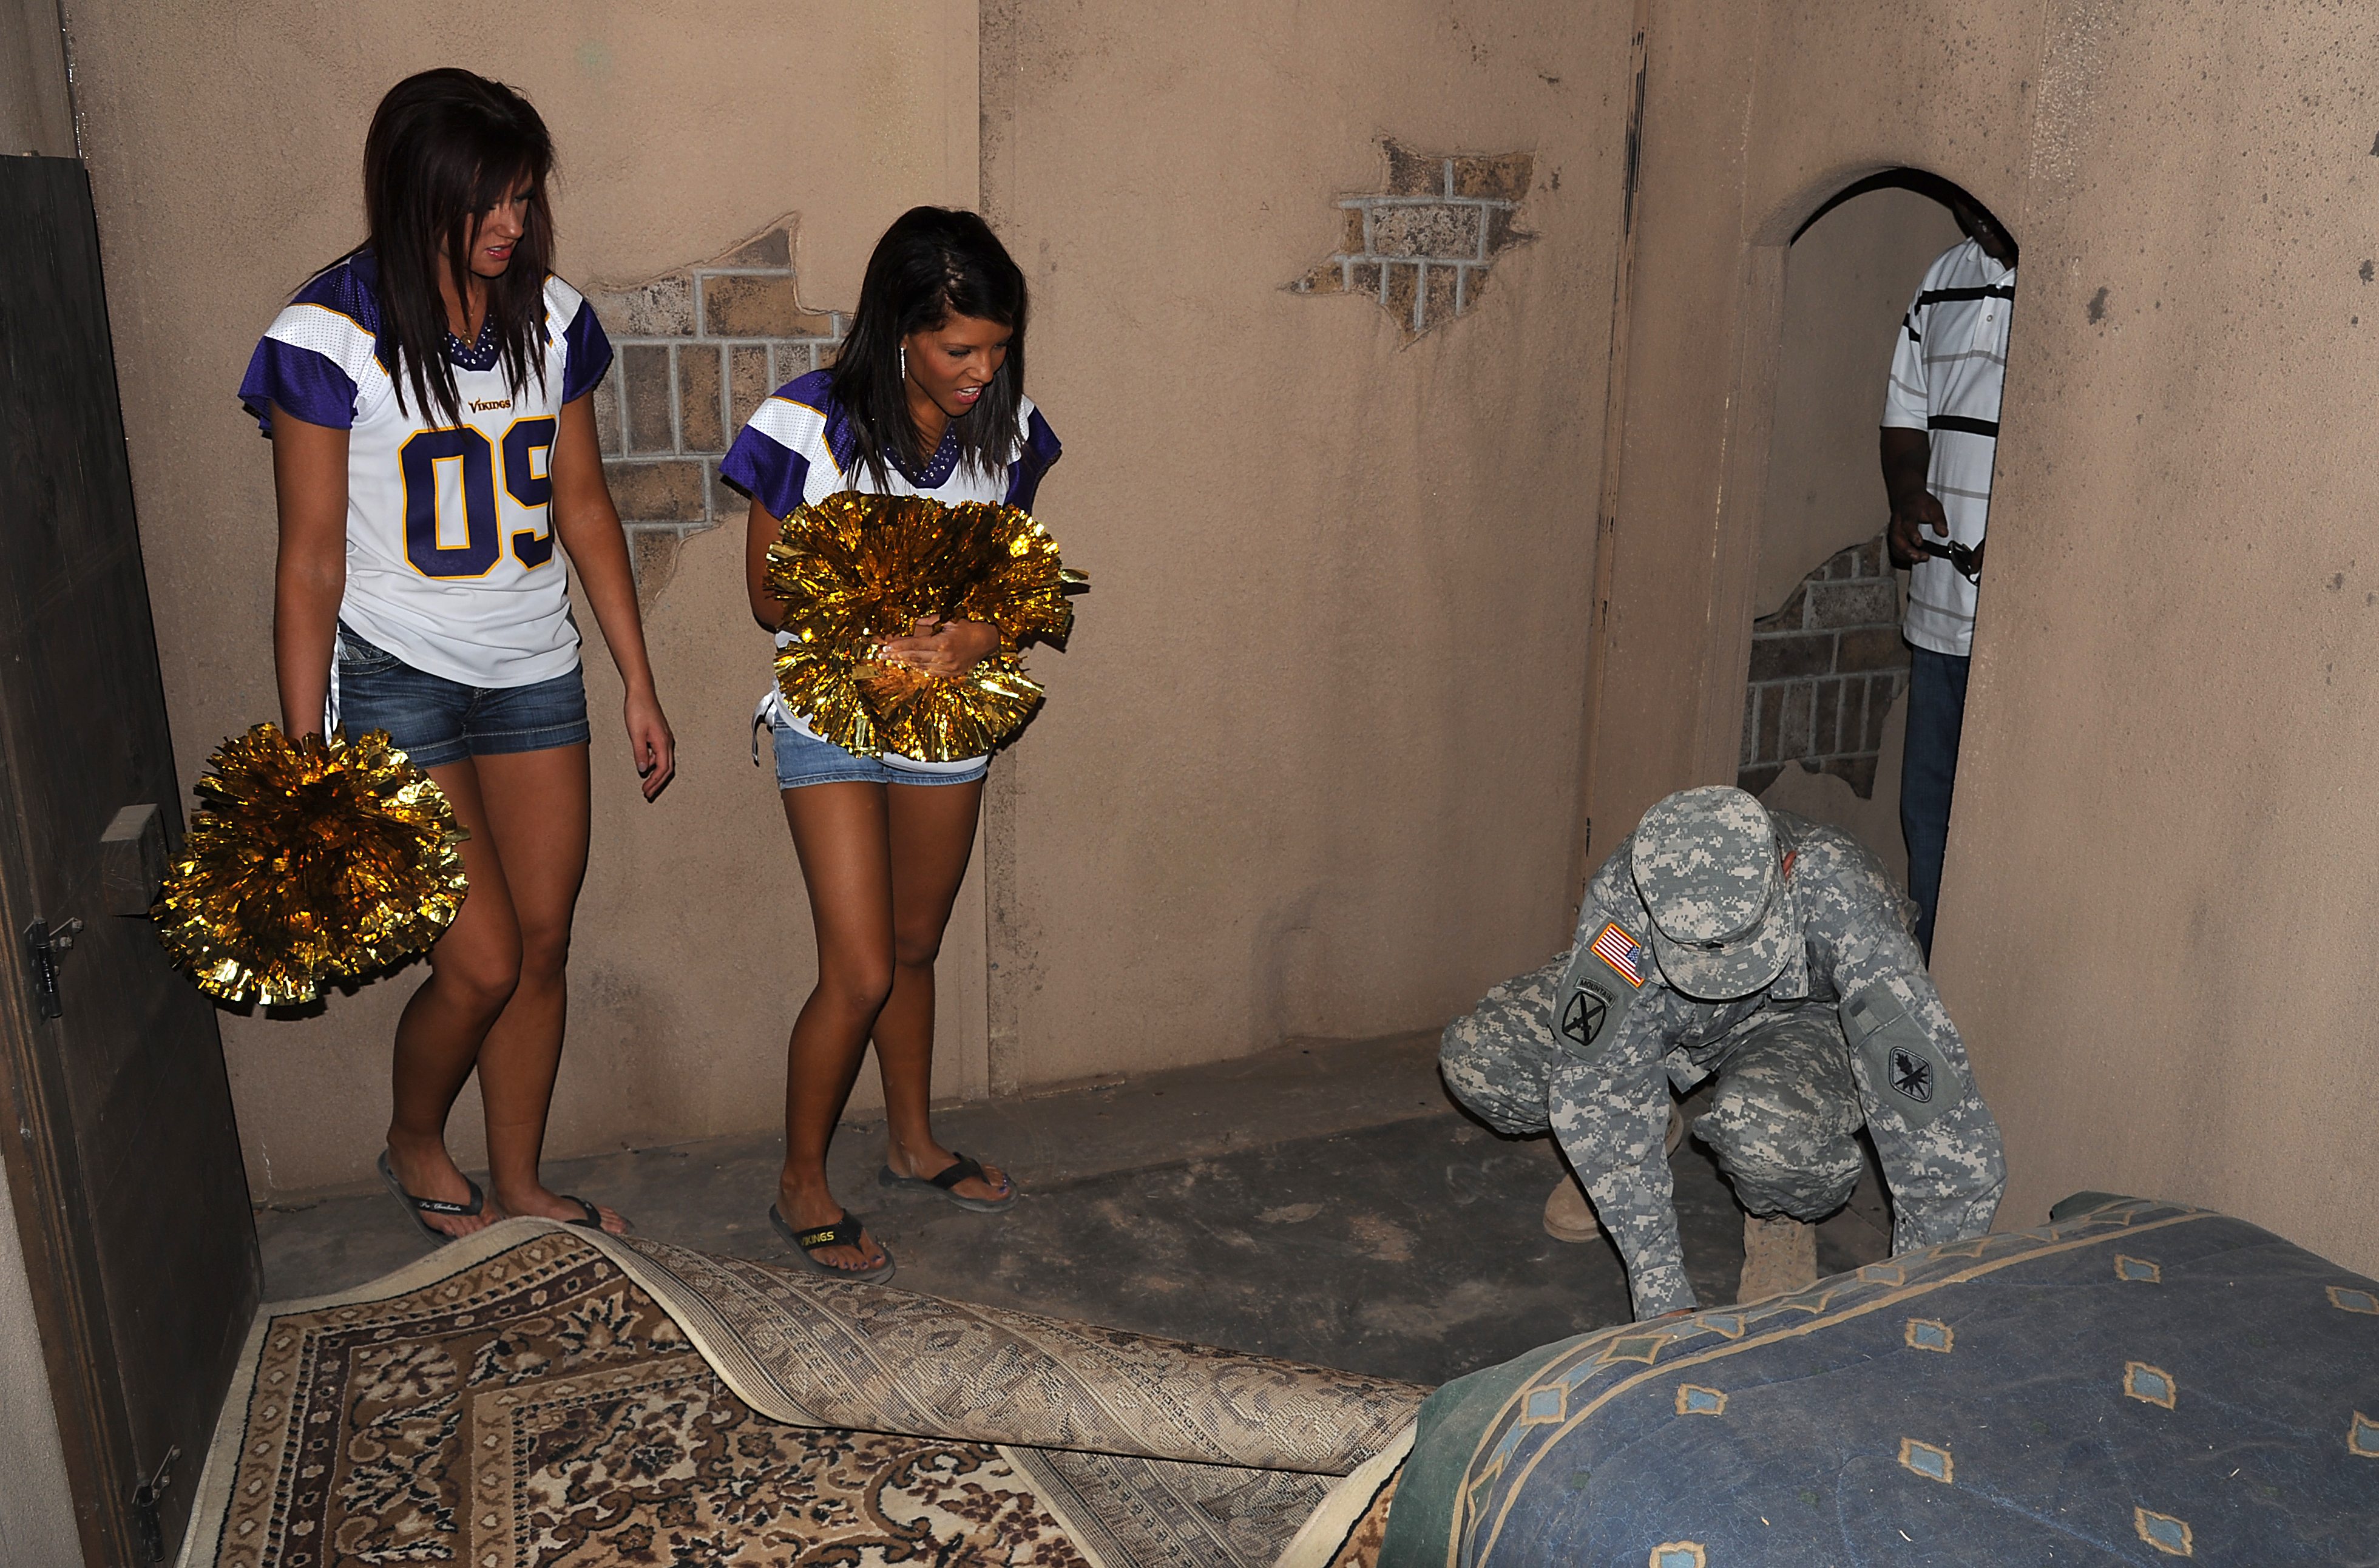 Cheerleader trap Caught in